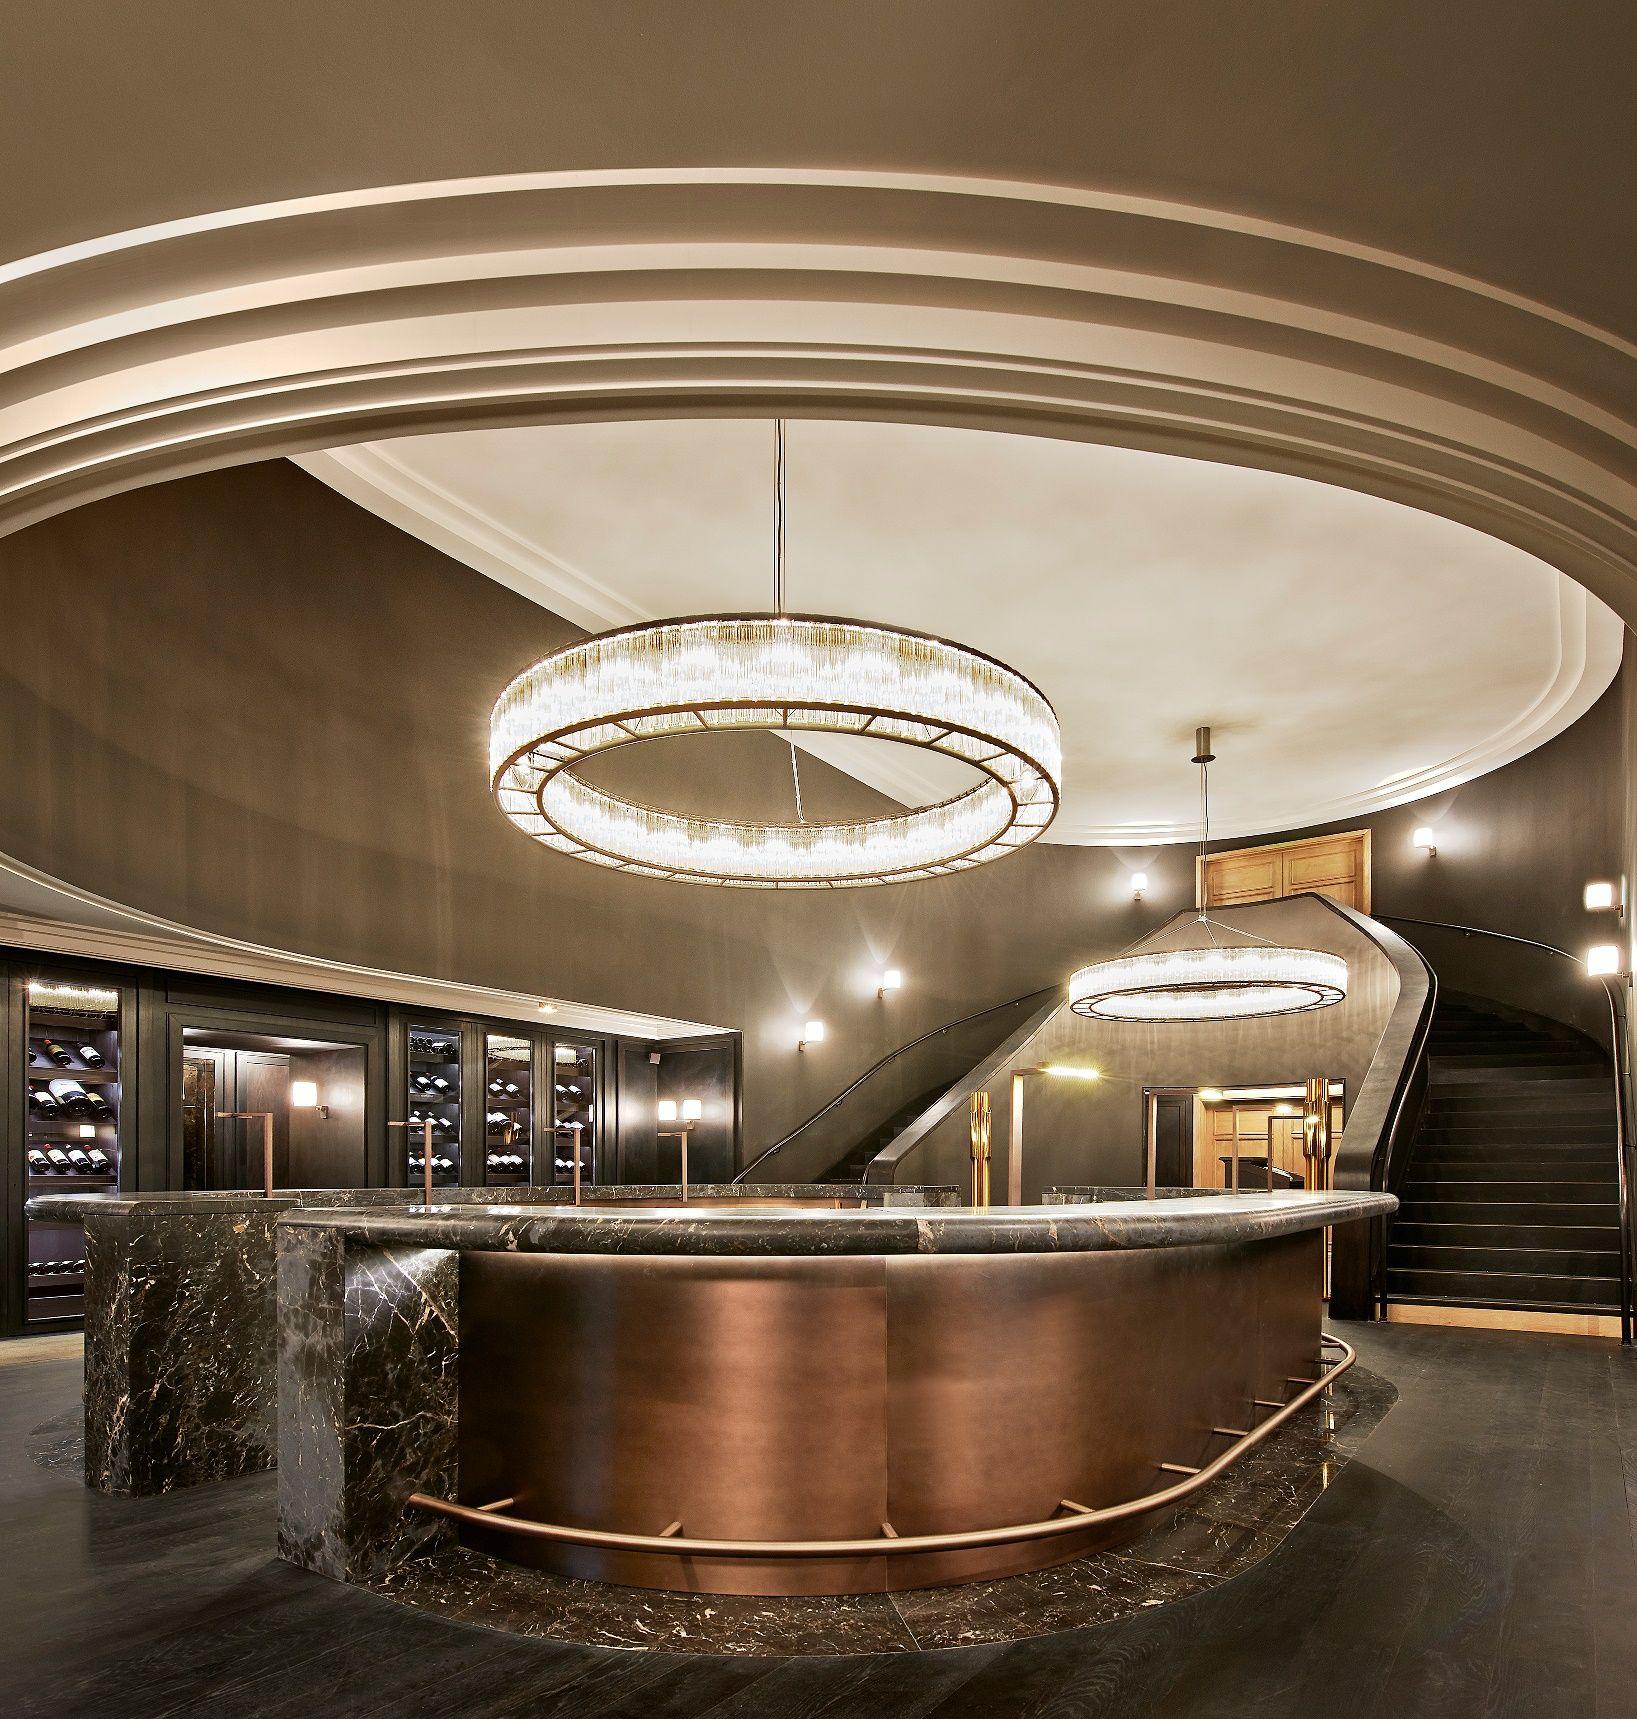 Bar And Lounge Interior Design: Bar Interior Design, Luxury